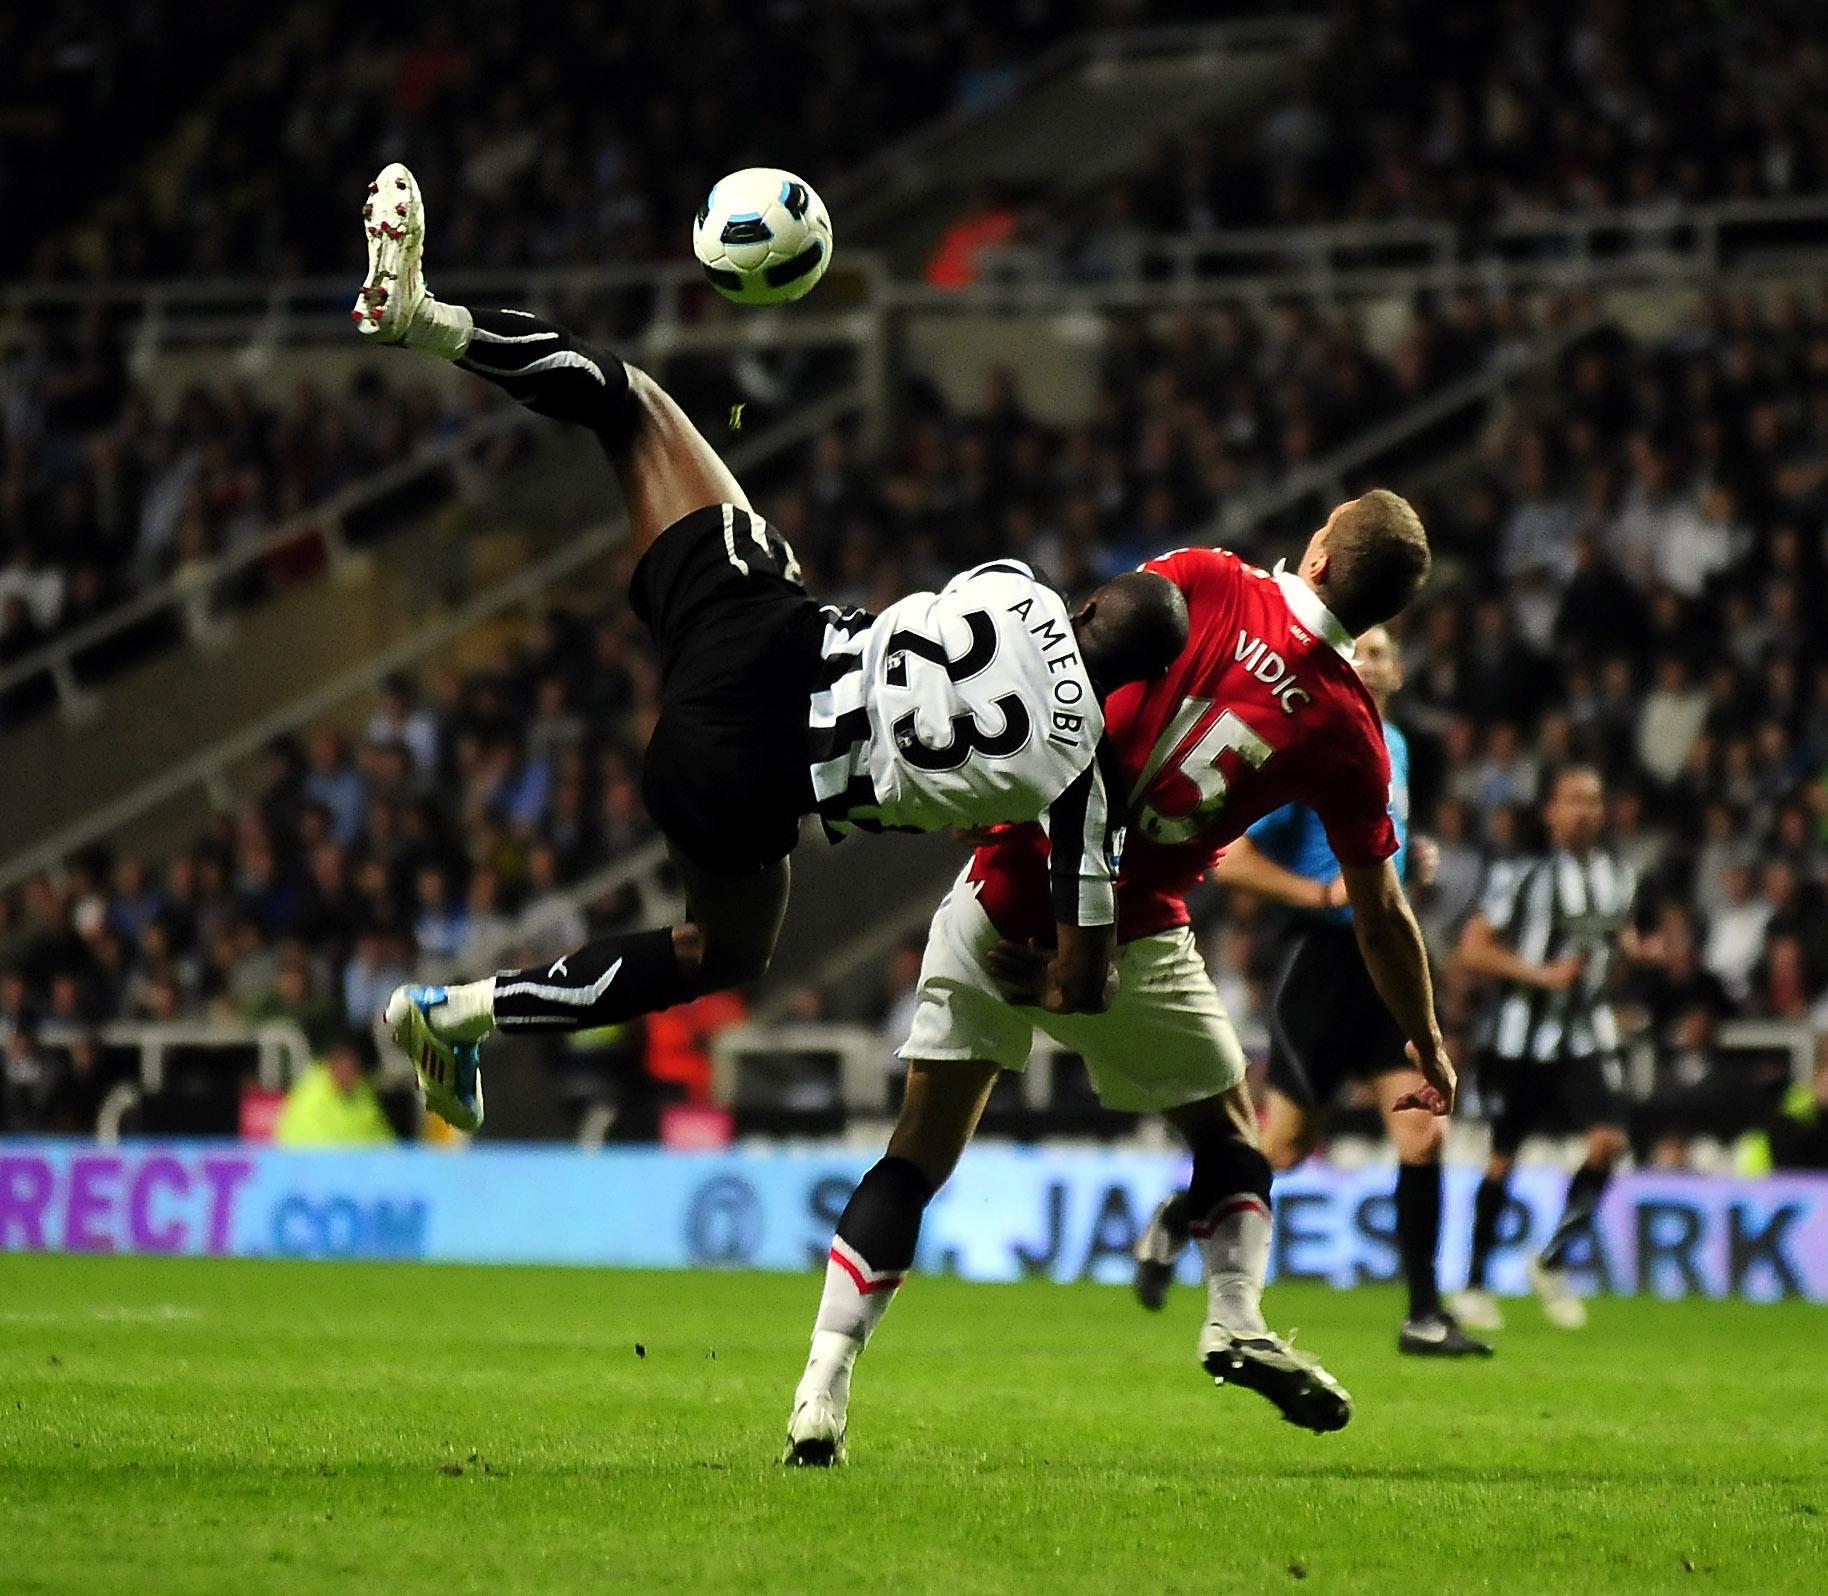 Barclays Premier League: Barclays Premier League